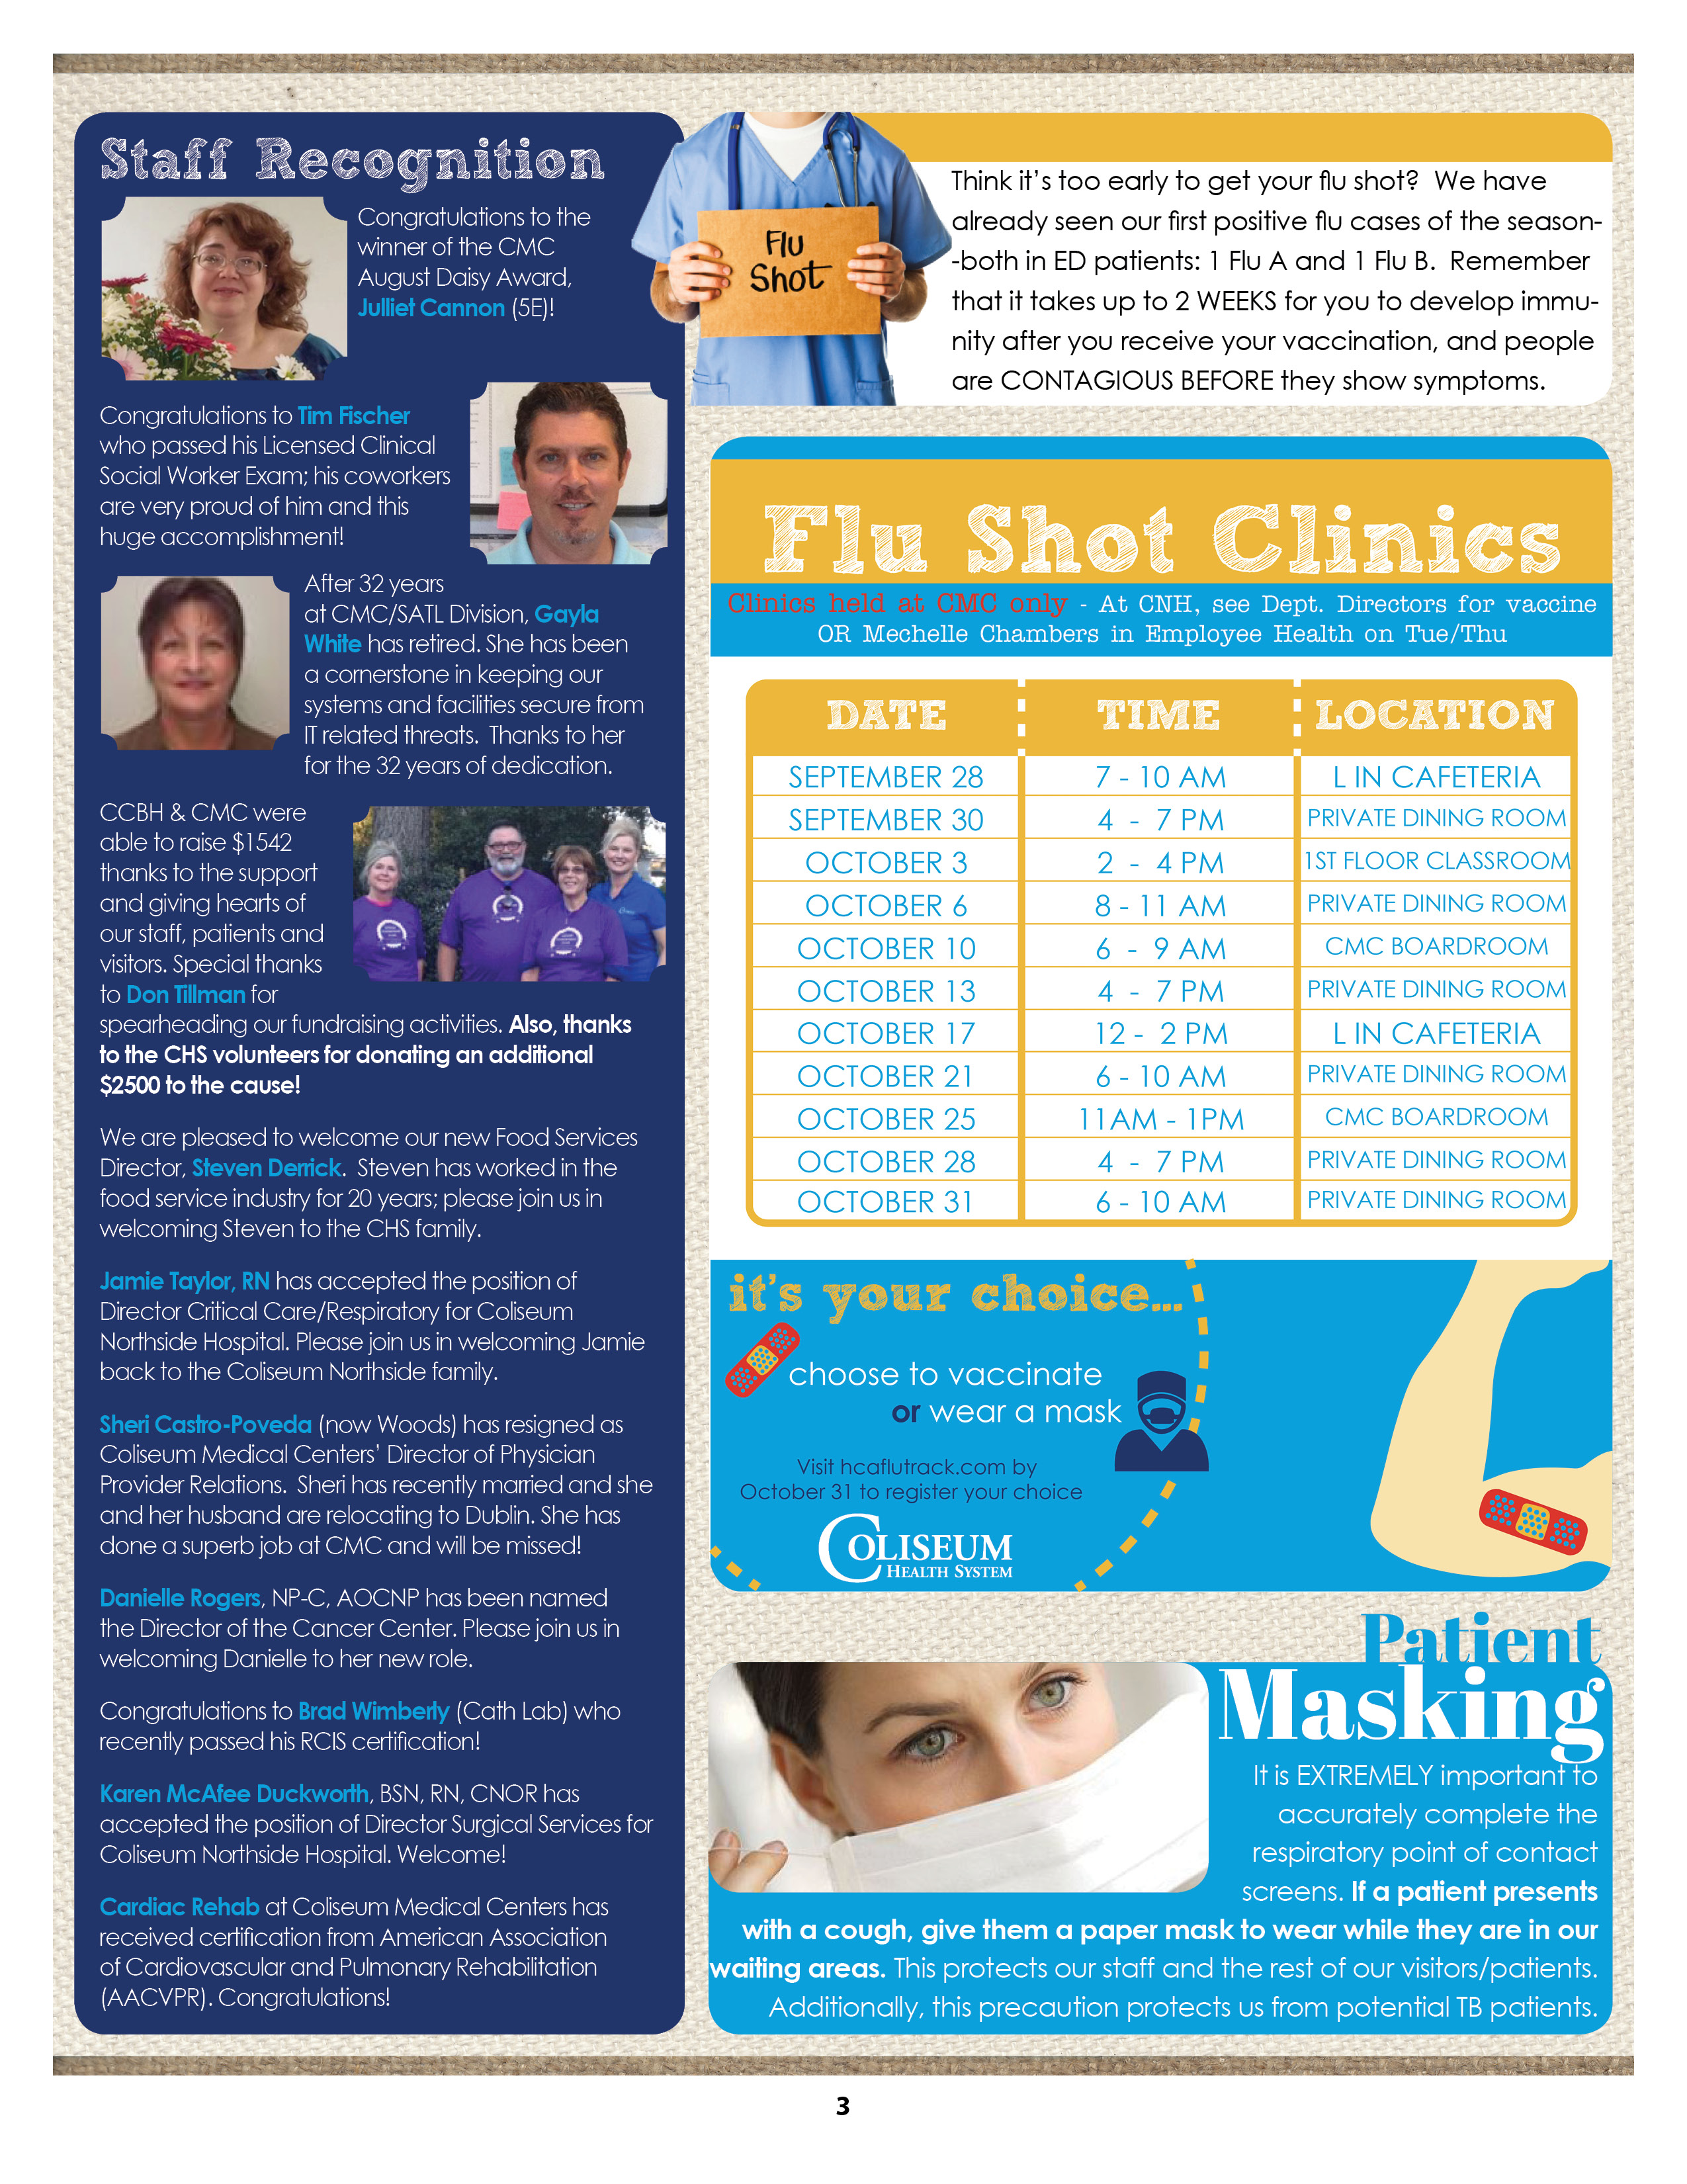 Septoct Main Artery 2016pg 3 Coliseum Health System